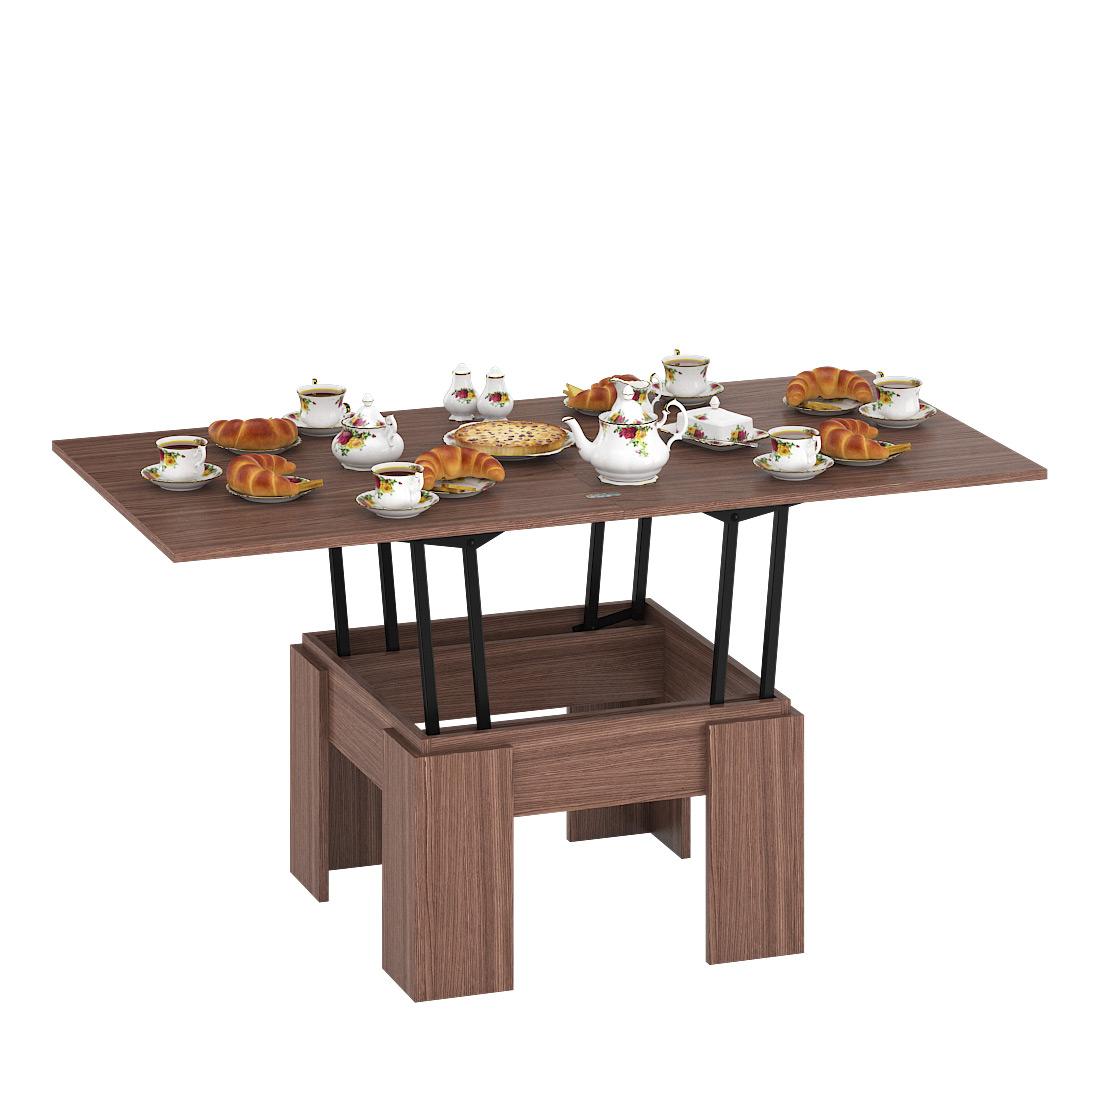 Журнальный столик Delice Бета 1668004 80(160)х80х47,5(81,5)